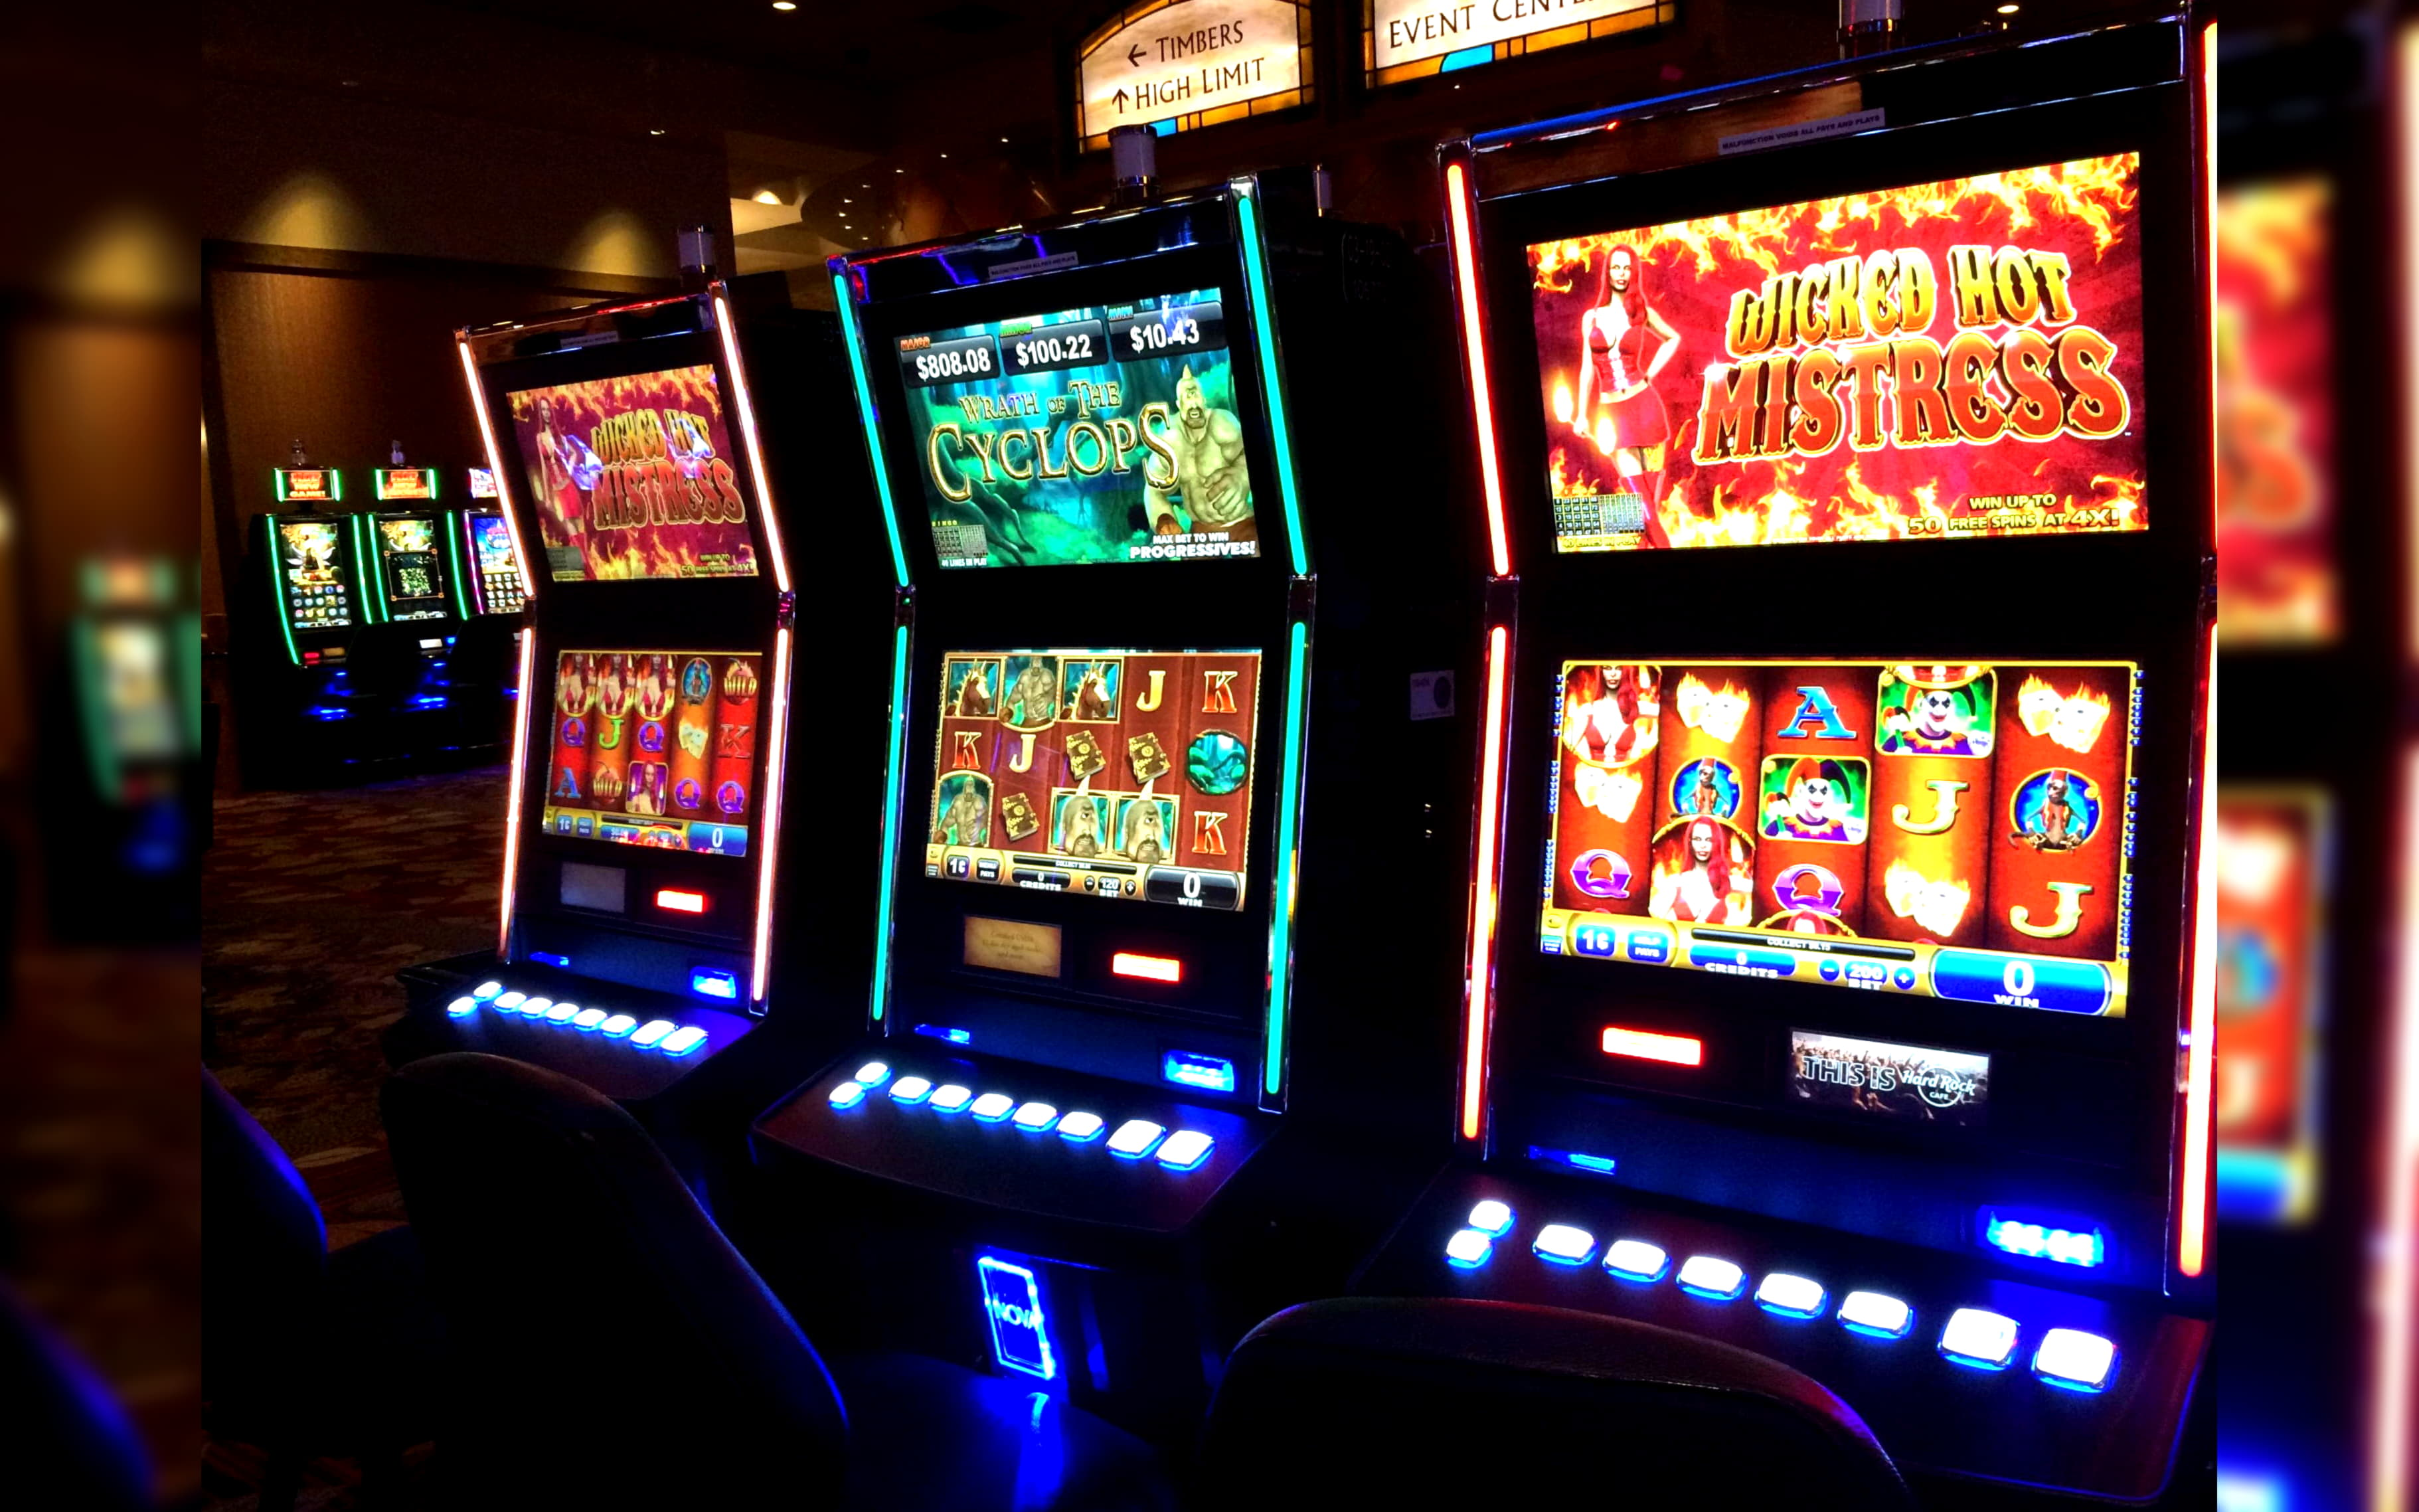 Eur 3115 no deposit casino bonus at bWin Casino